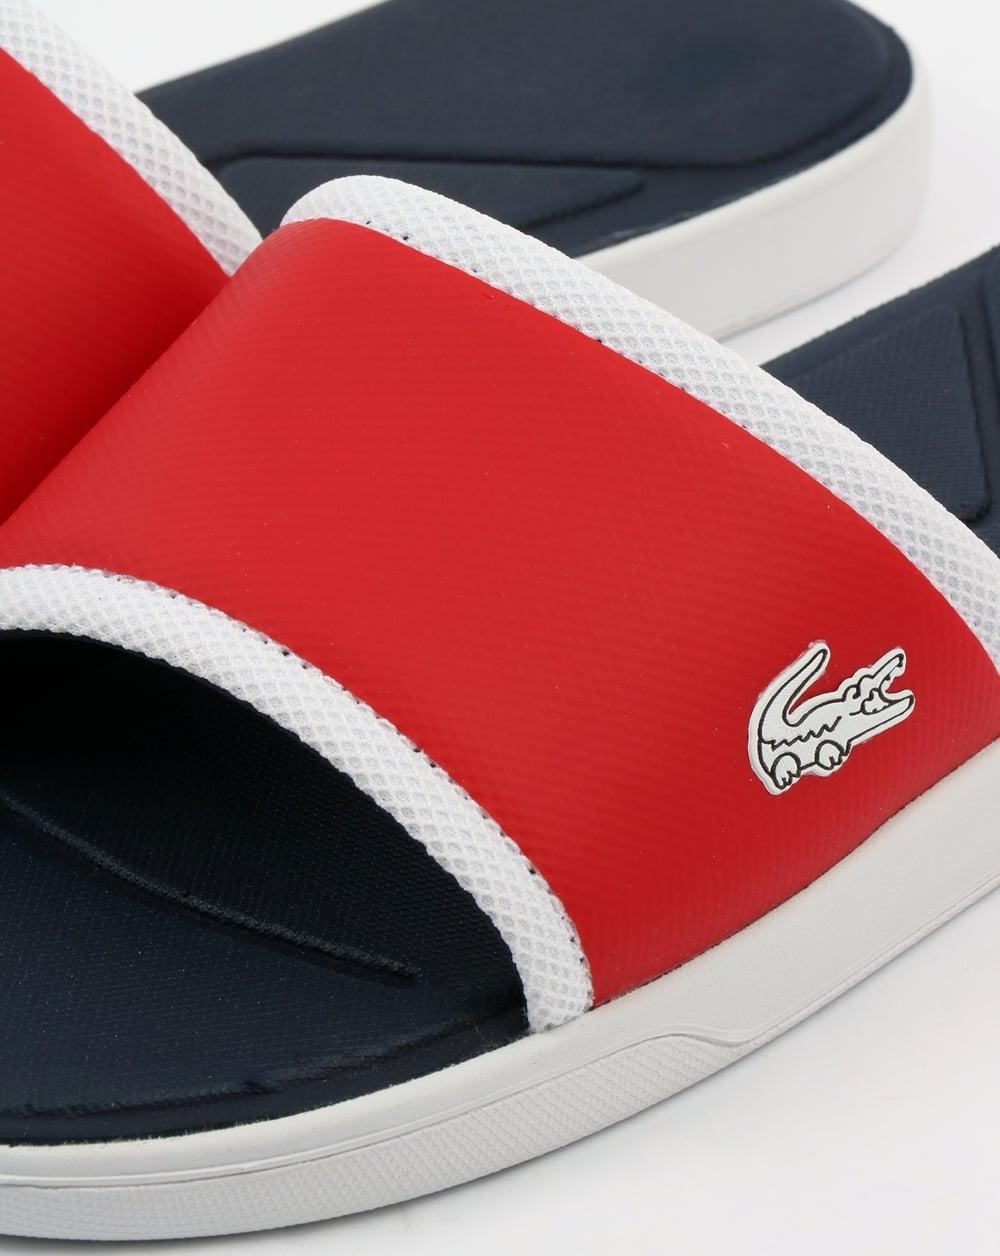 4c837a995 Lacoste Footwear L.30 Sliders Red